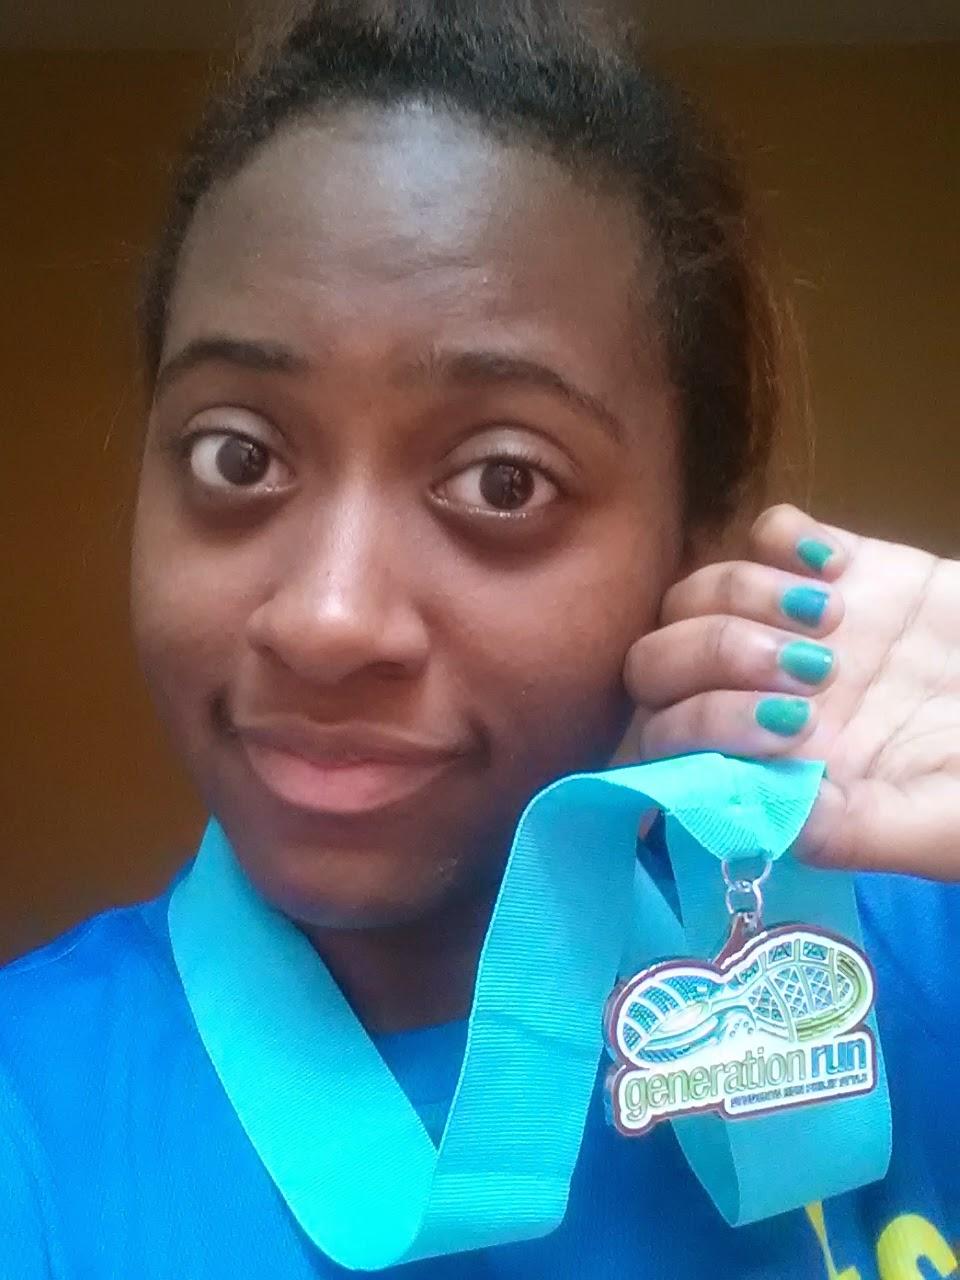 Girl holding a medal near her face